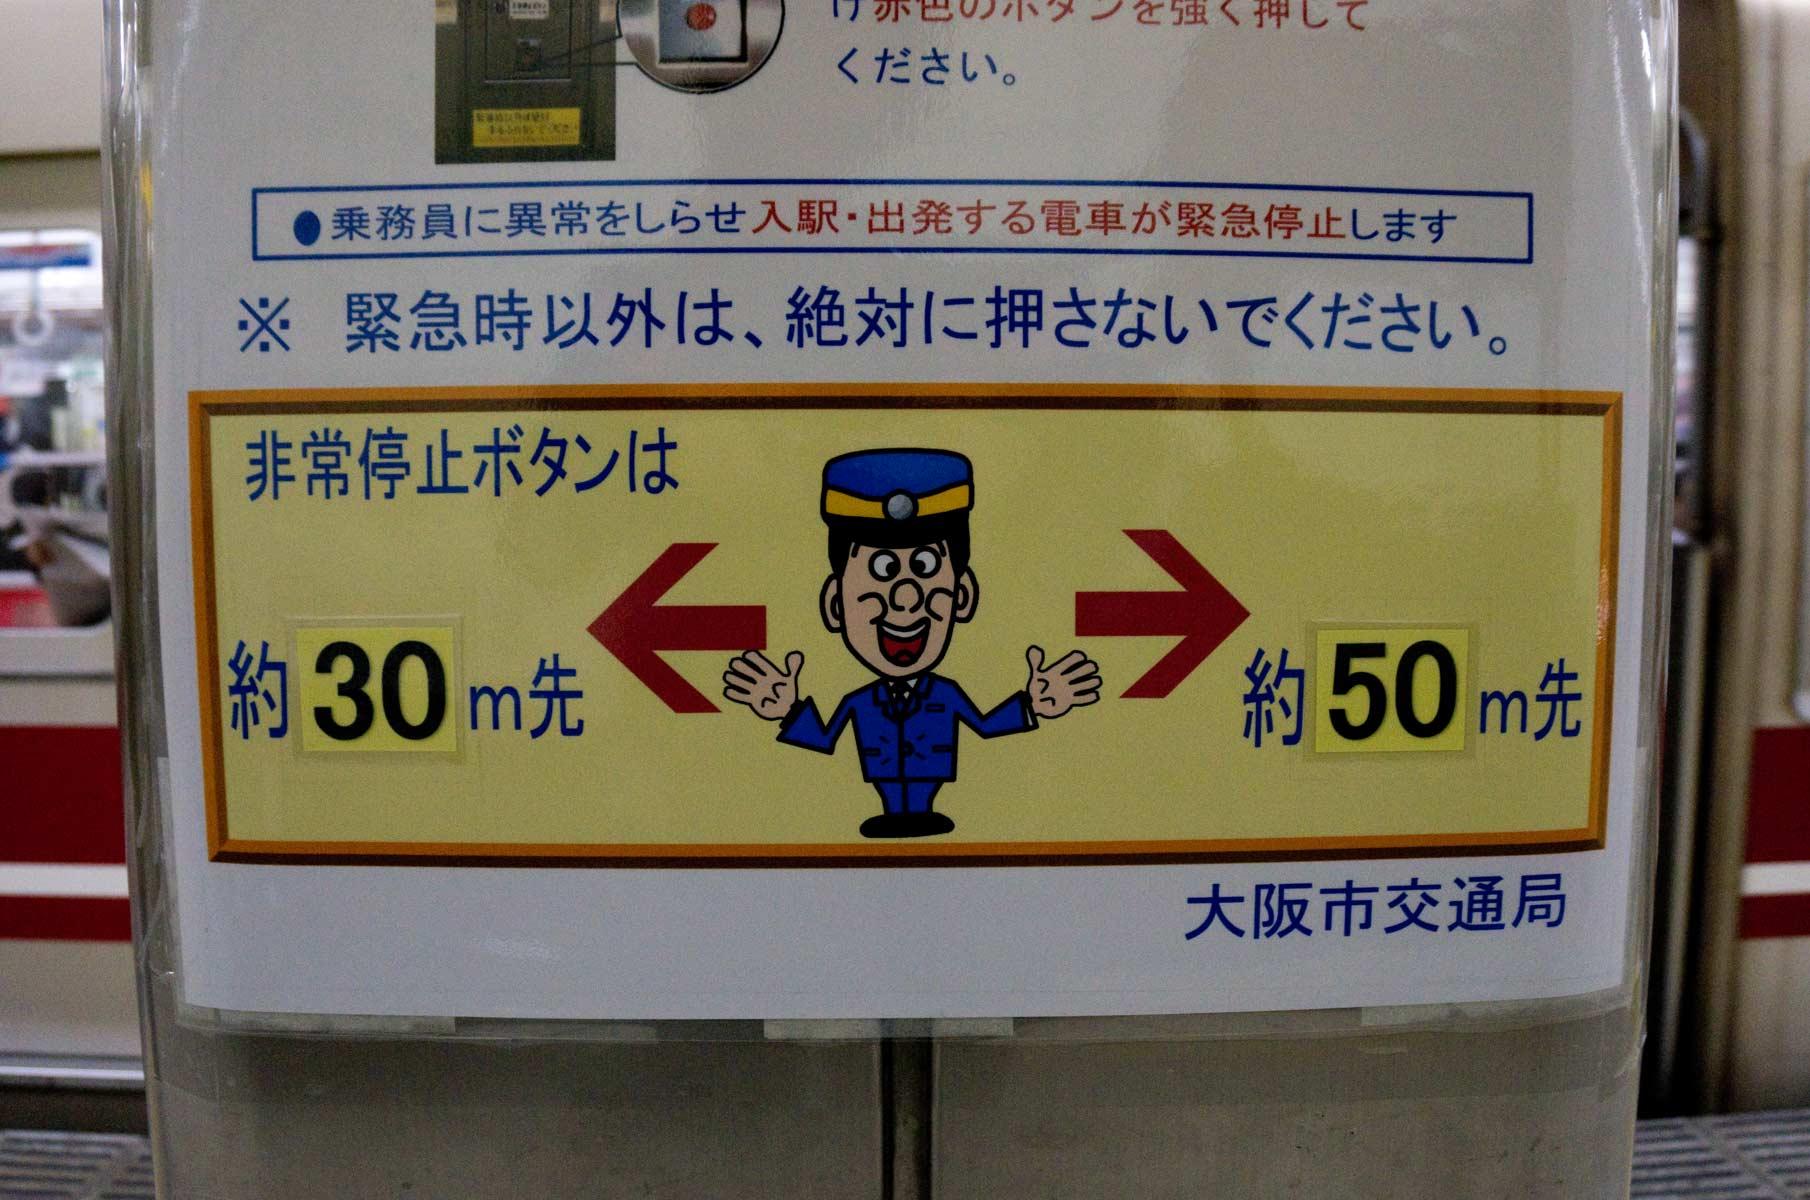 U-Bahn Schild in Osaka, Japan